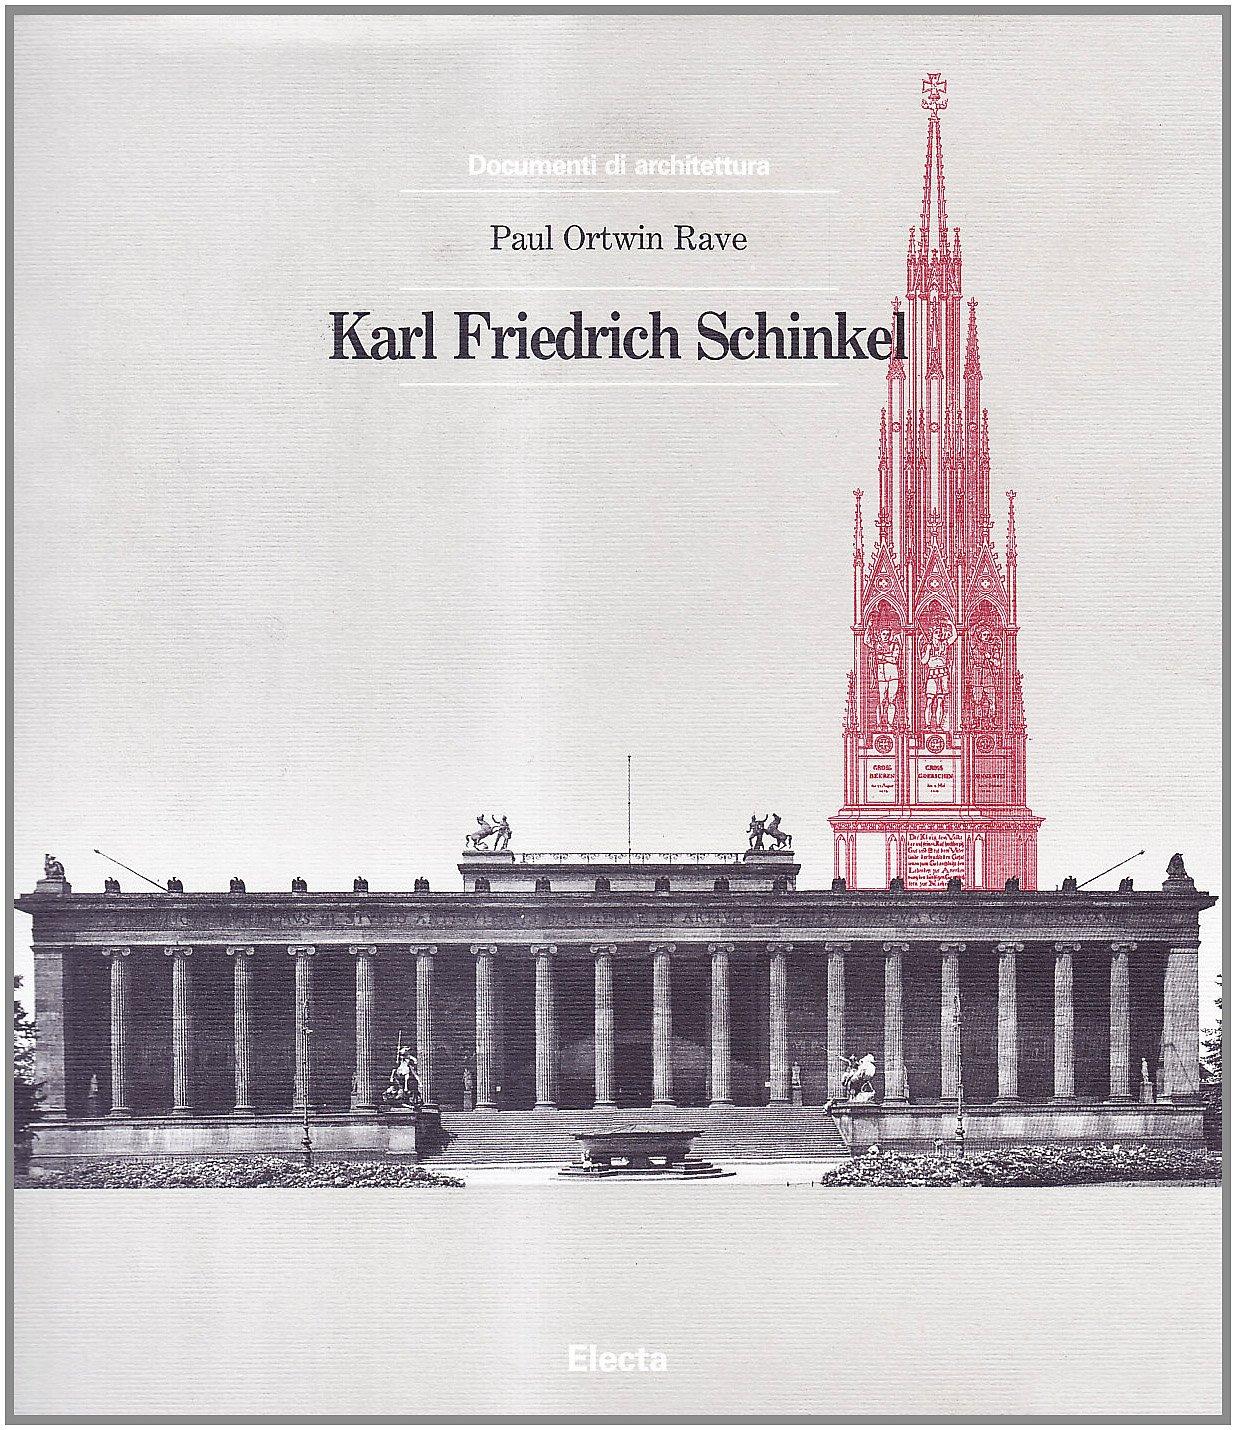 Karl Friedrich Schinkel. Ediz. illustrata Copertina flessibile – 4 apr 1989 Paul Ortwin Rave Mondadori Electa 8843527916 301713